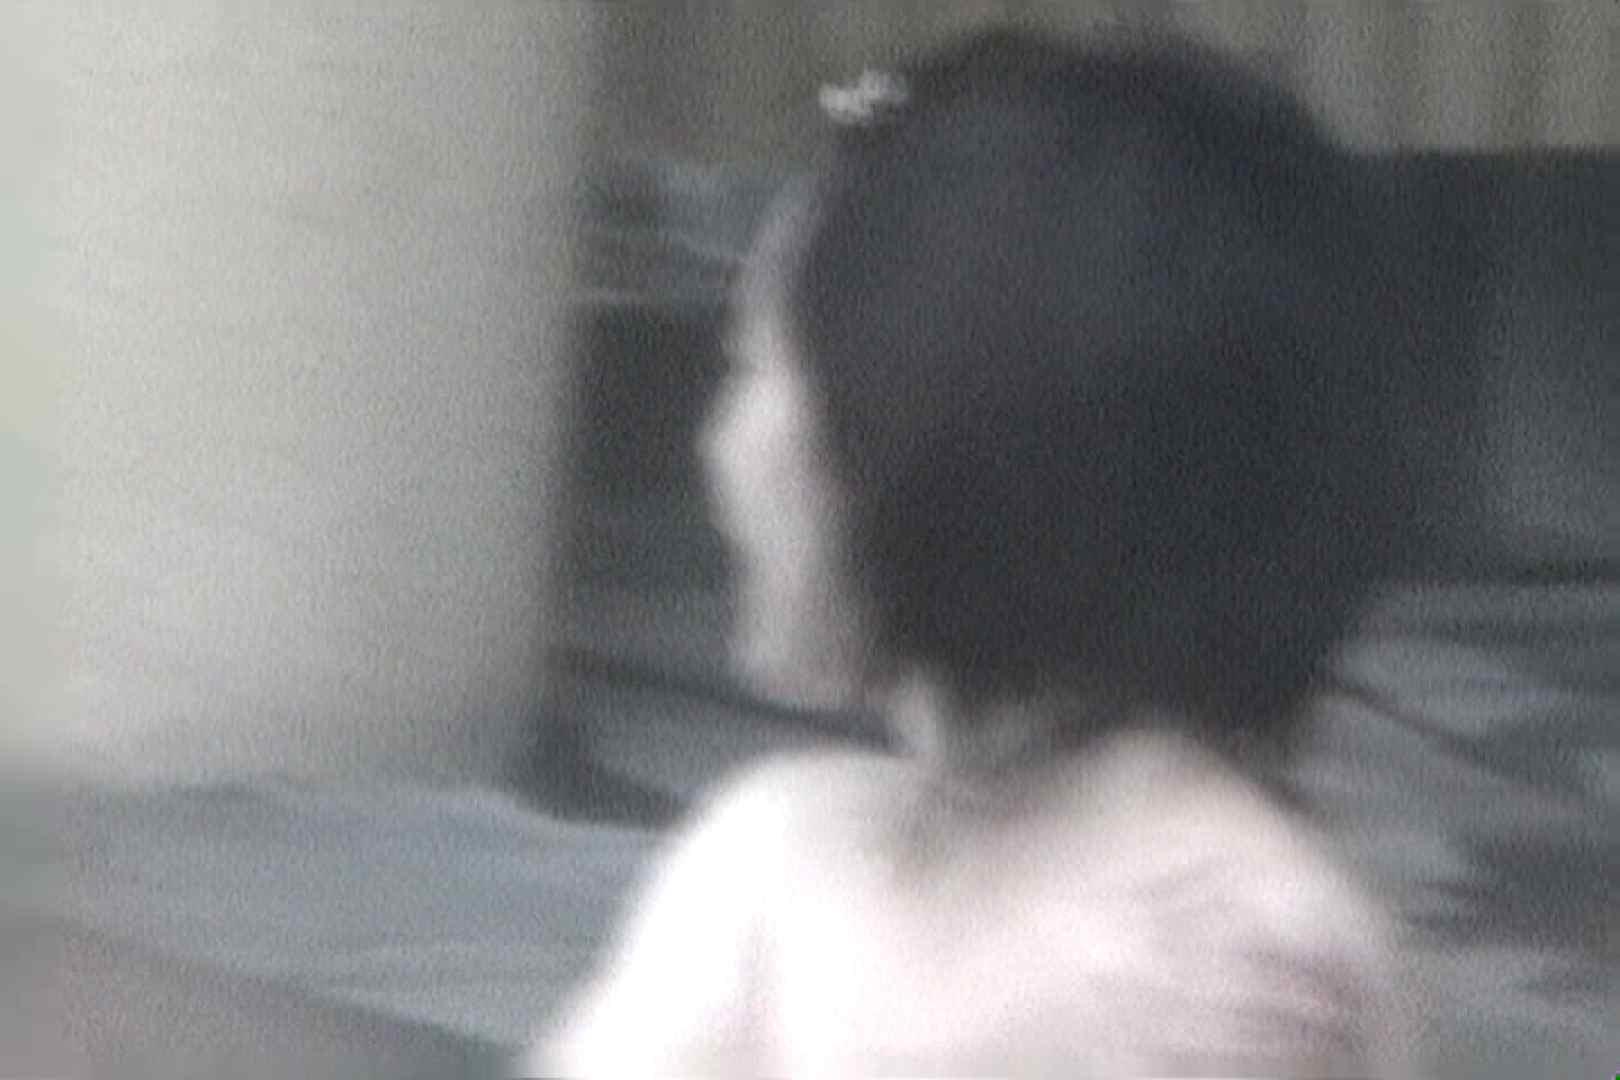 女露天風呂劇場 Vol.38 丸見え セックス無修正動画無料 56画像 56